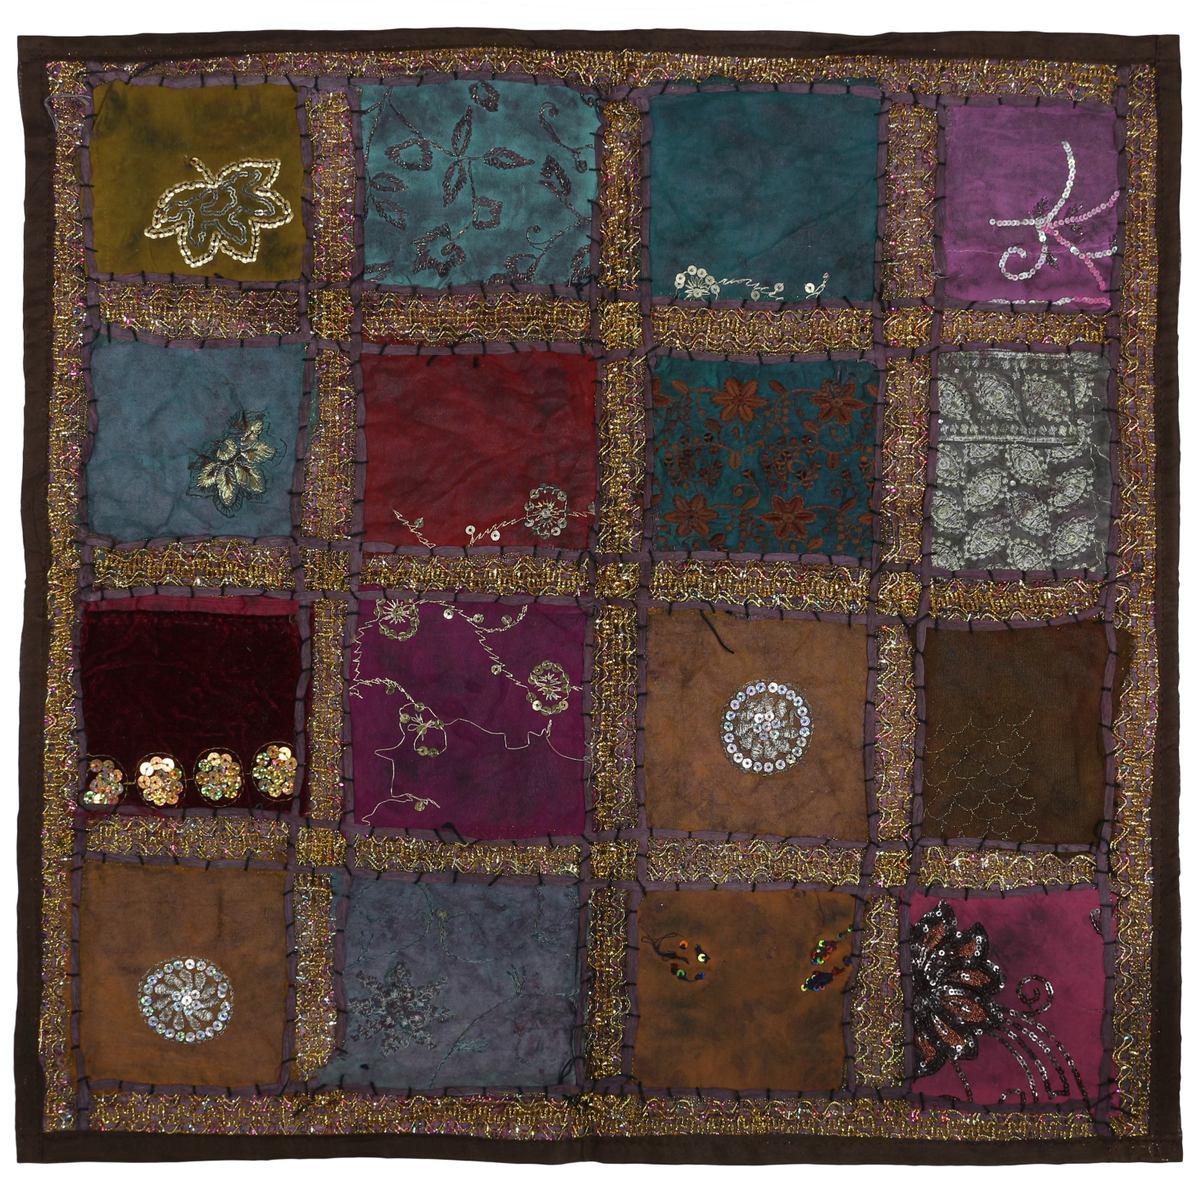 kissenh lle patchwork indien kissenbezug berzug bezug h lle sari stoff 60x60 cm textilien. Black Bedroom Furniture Sets. Home Design Ideas